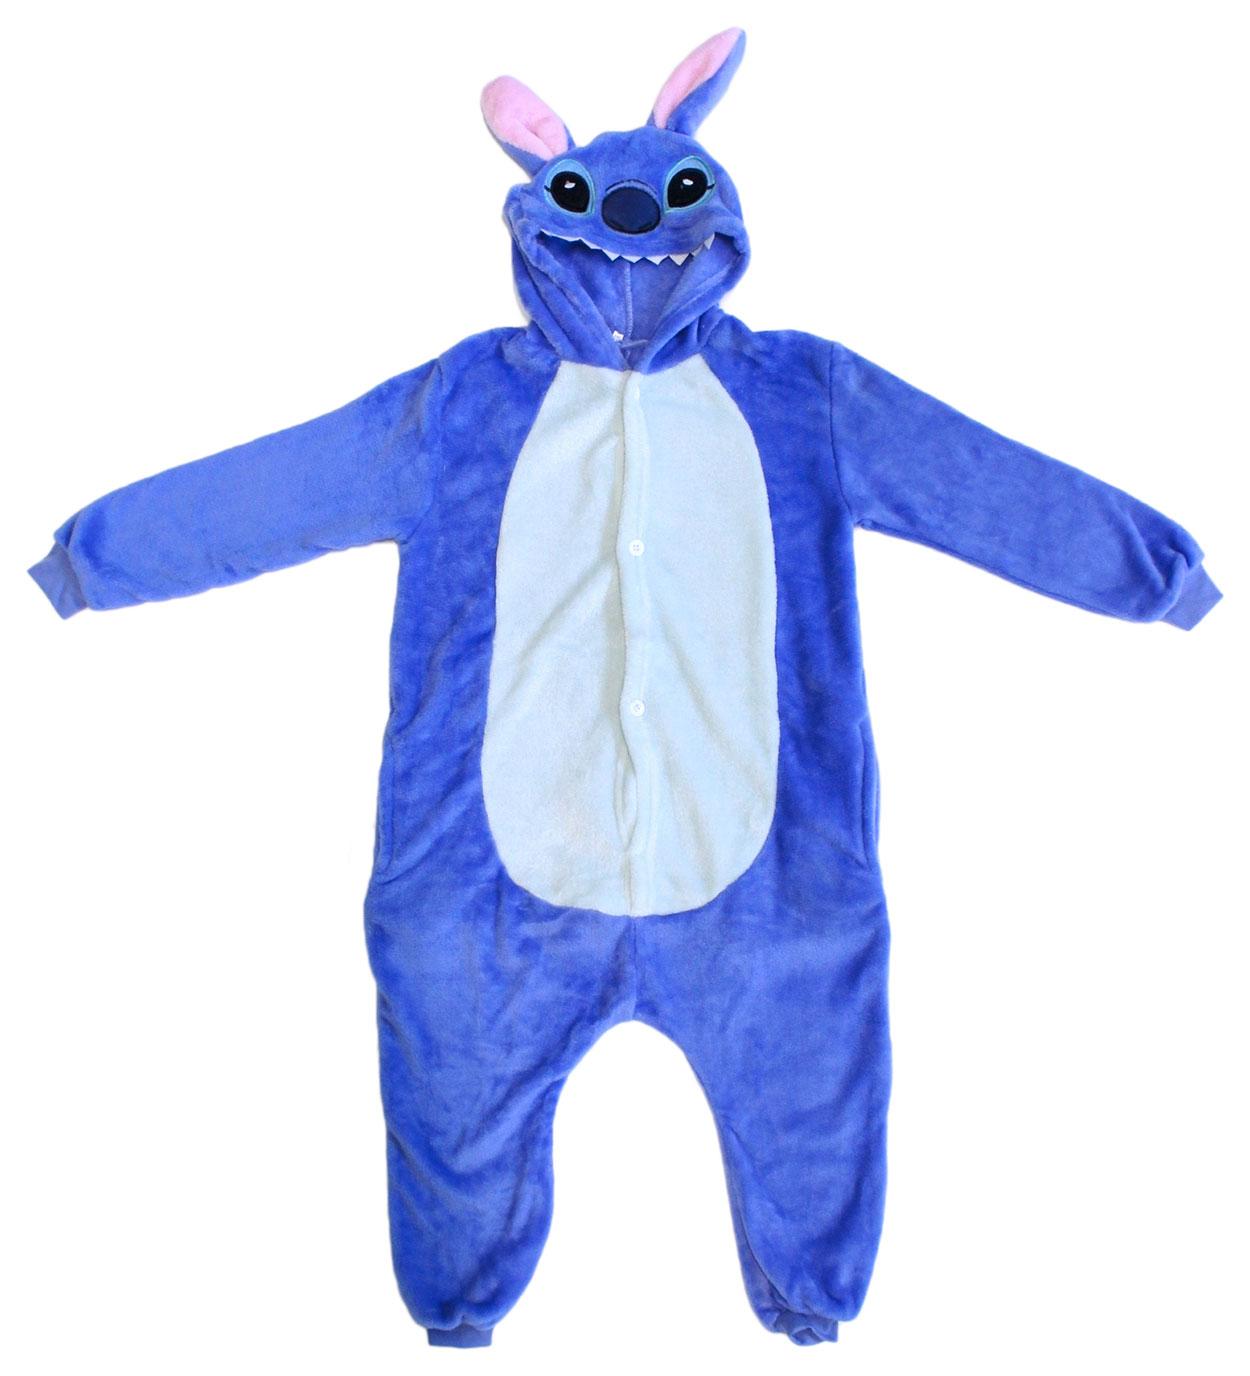 Пижама-кигуруми Lilkrok Синий Стич 96-105 см фото